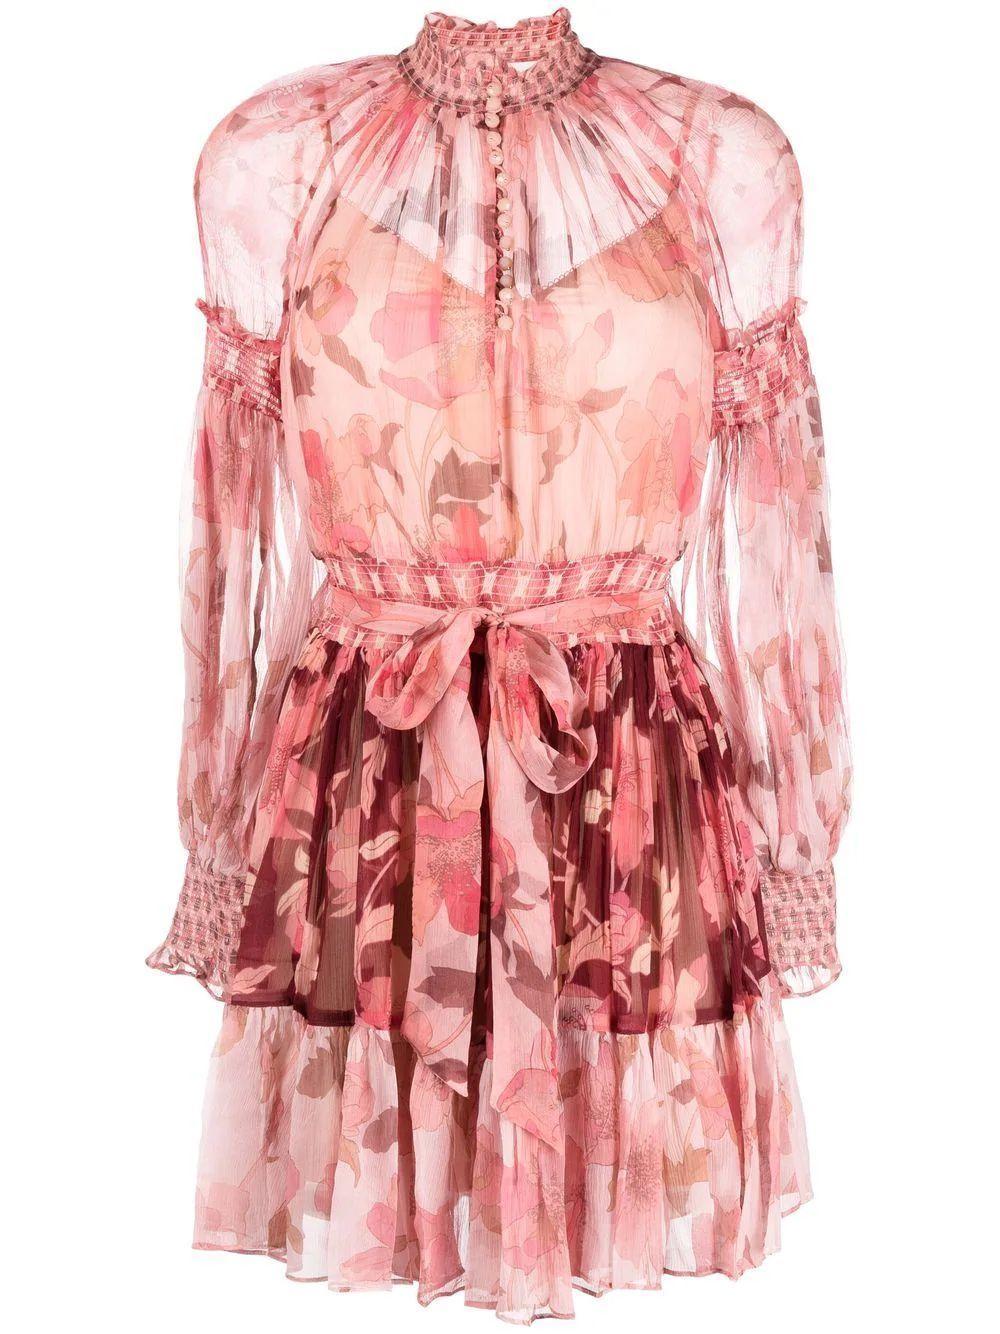 Concert Spliced Lantern Mini Dress Item # 2049DCON